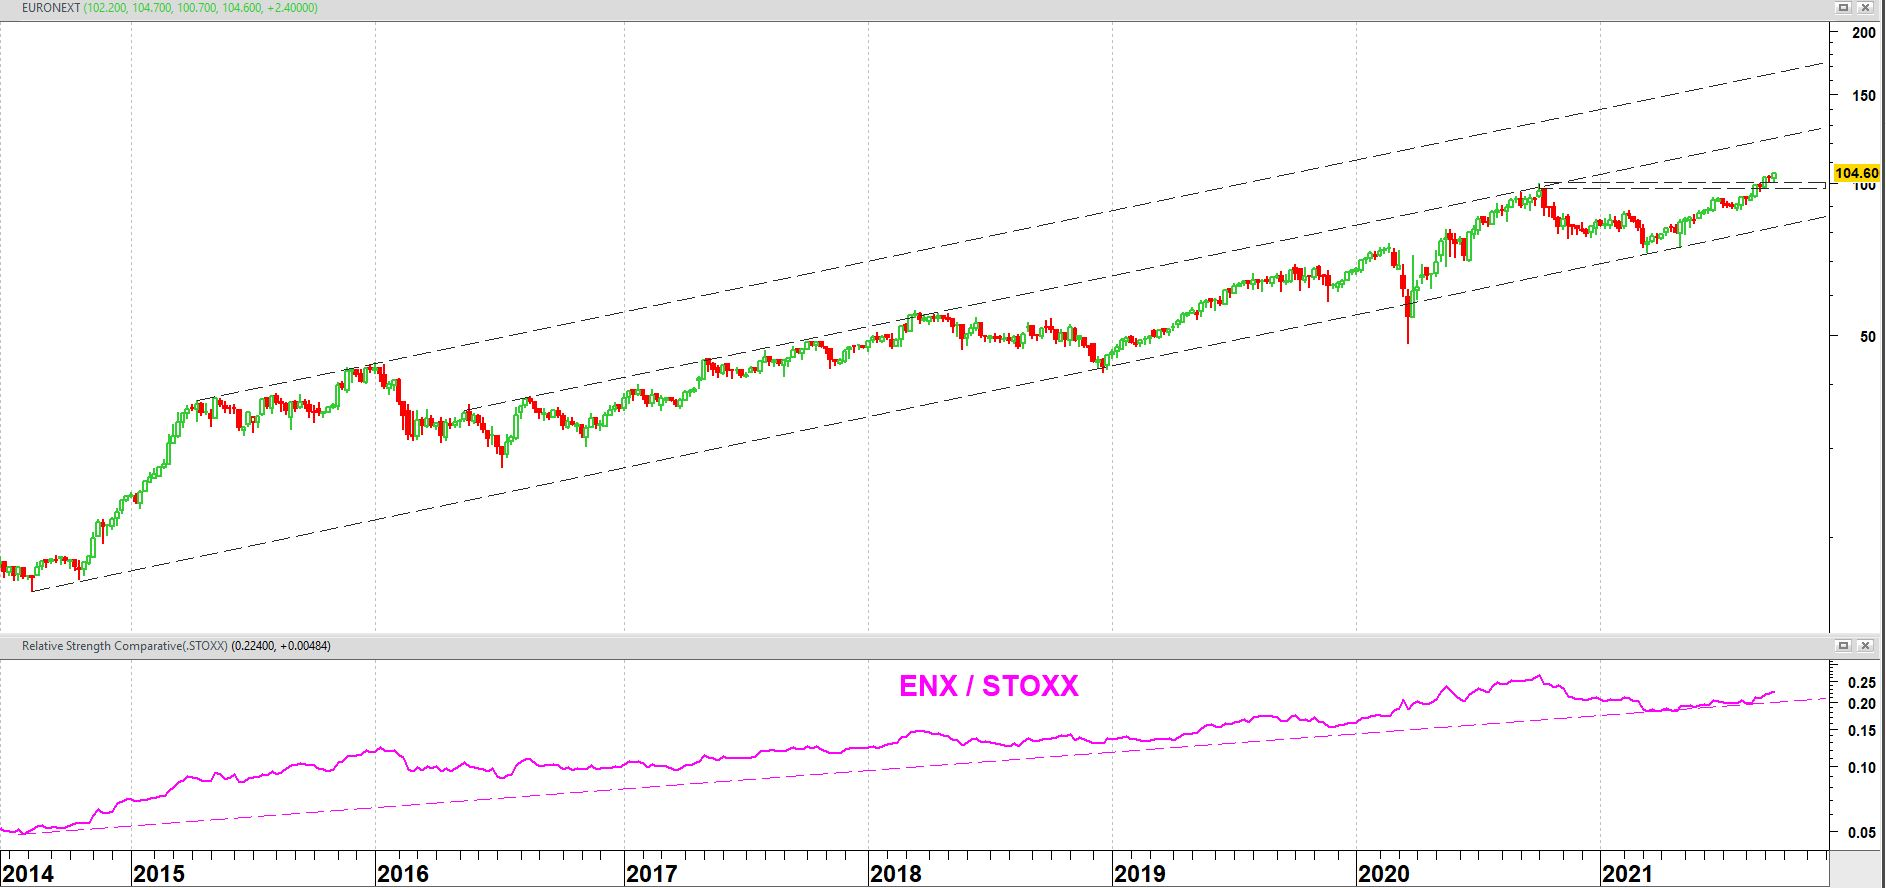 Euronext vanaf introductie medio 2014 + relatieve sterkte t.o.v. Europese DJ Stoxx 600